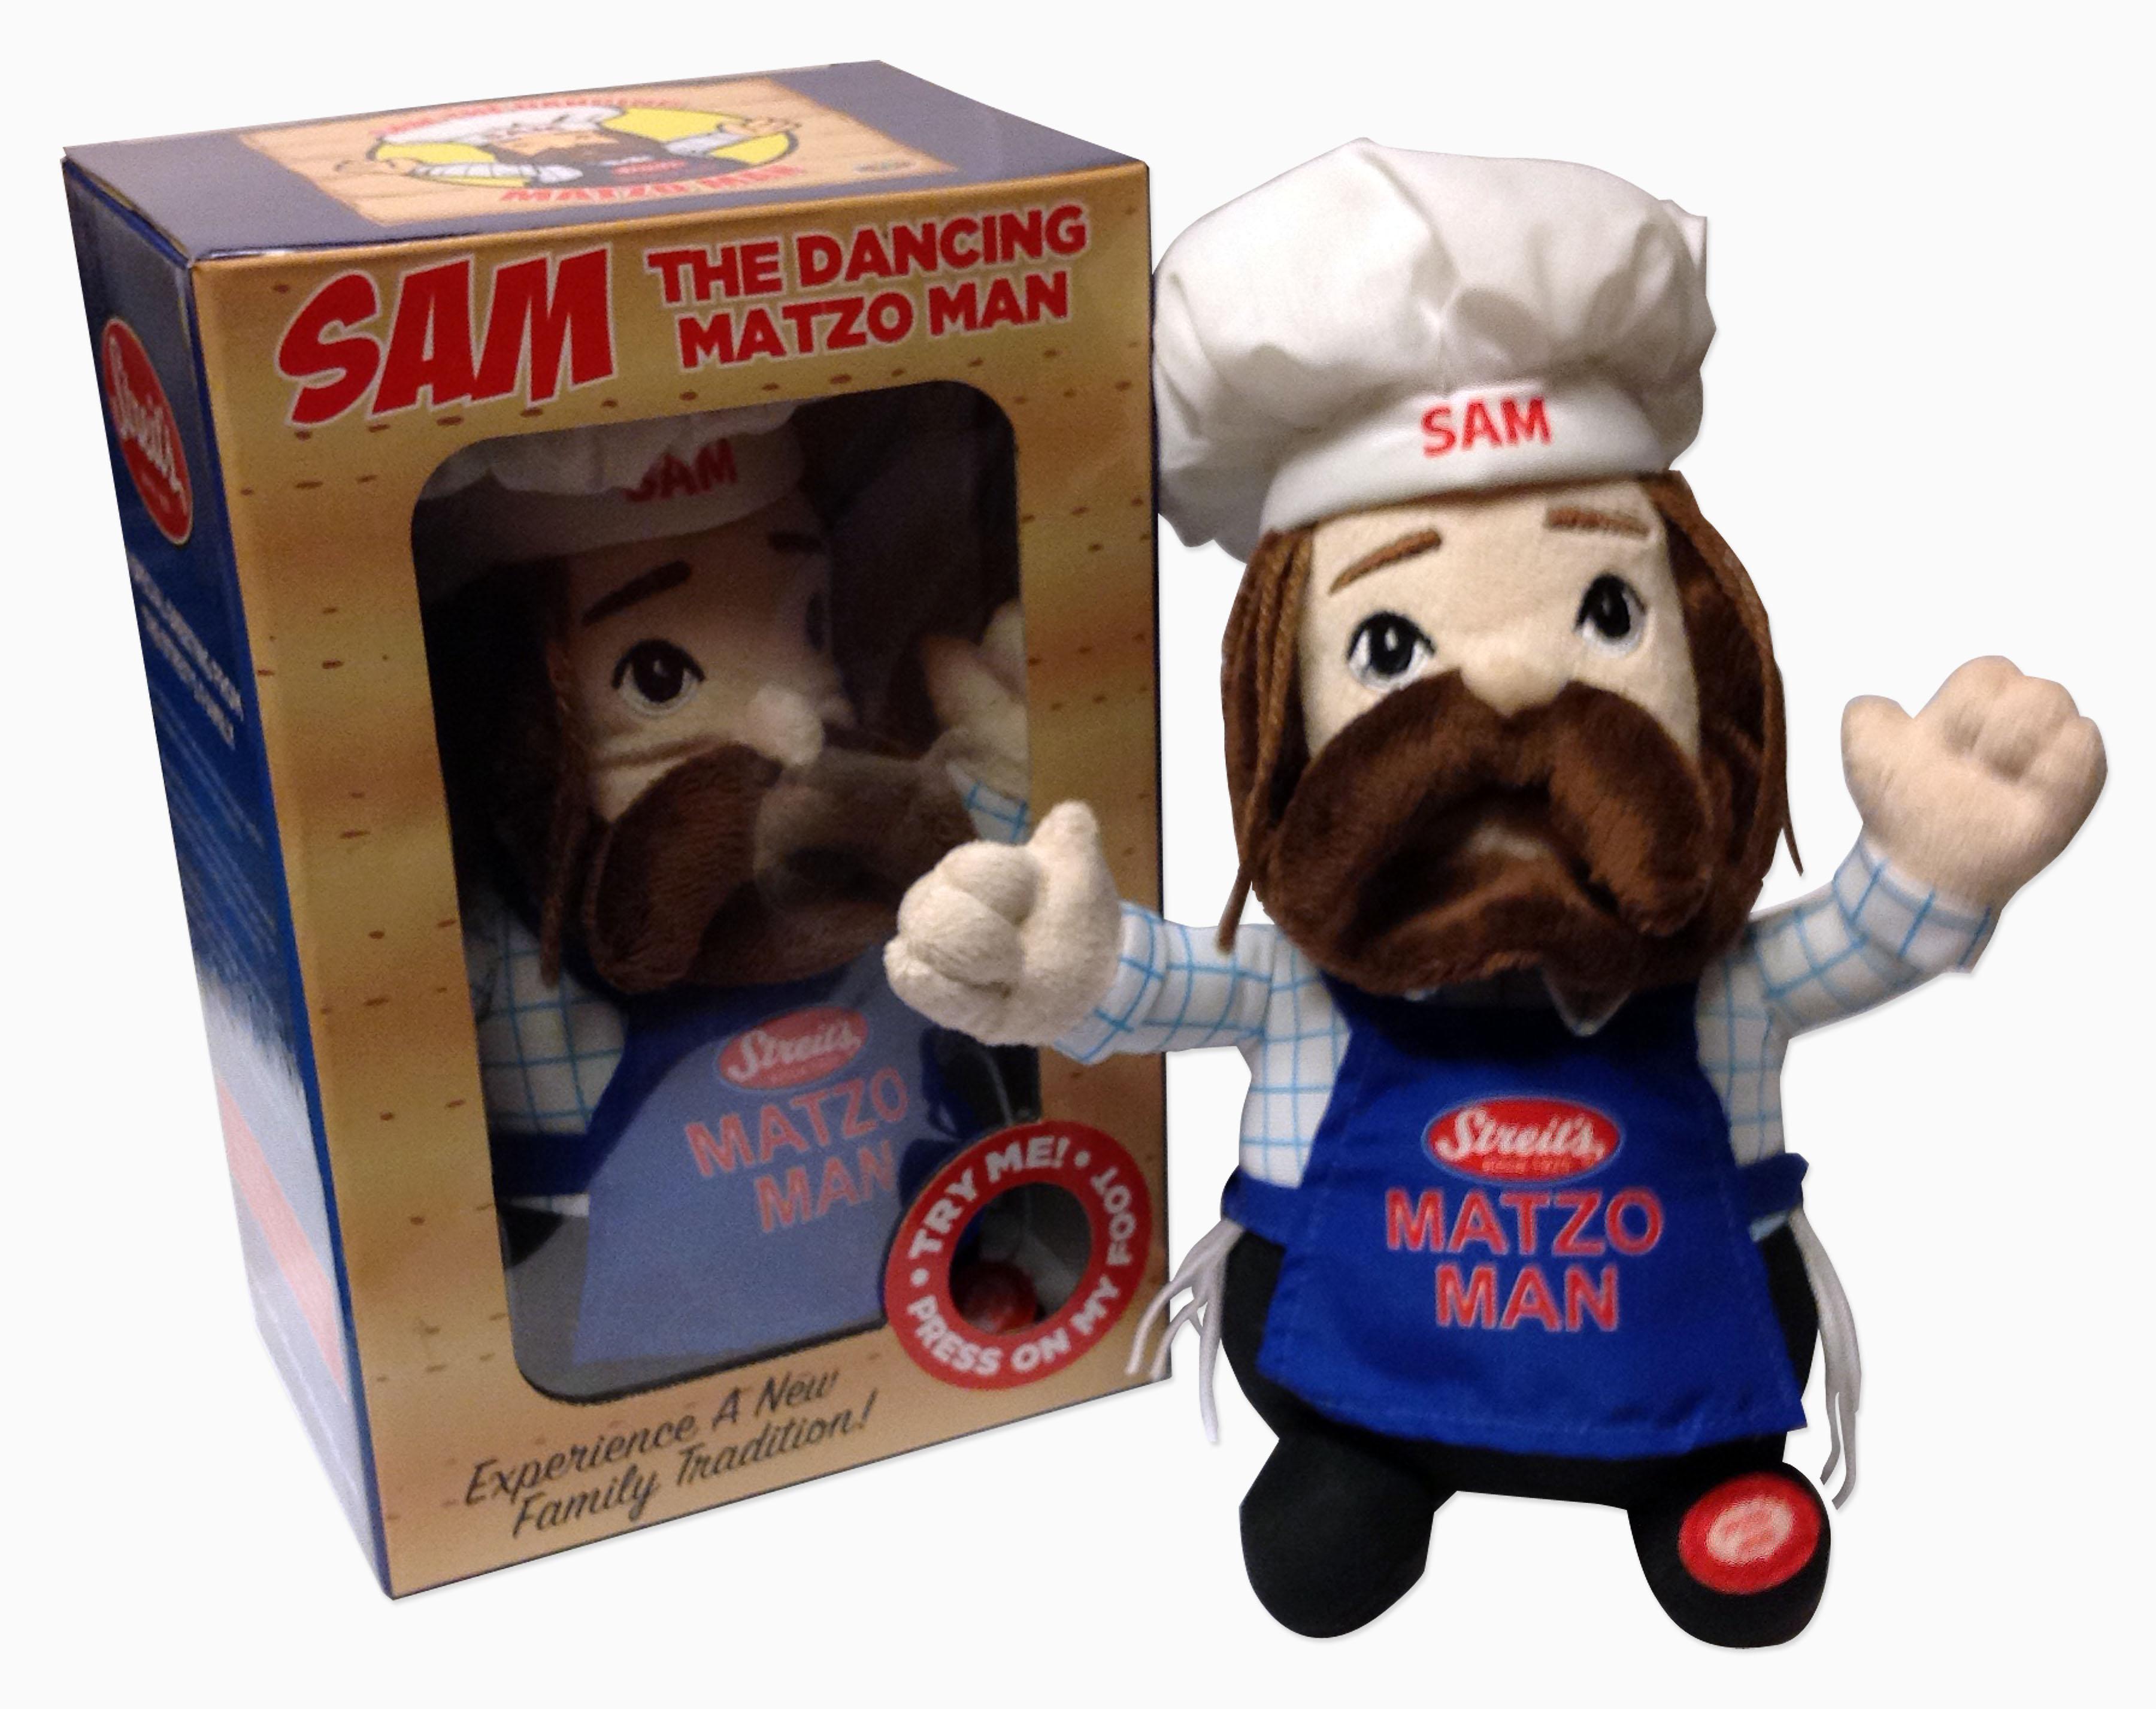 Streit's Sam the Matzo Man